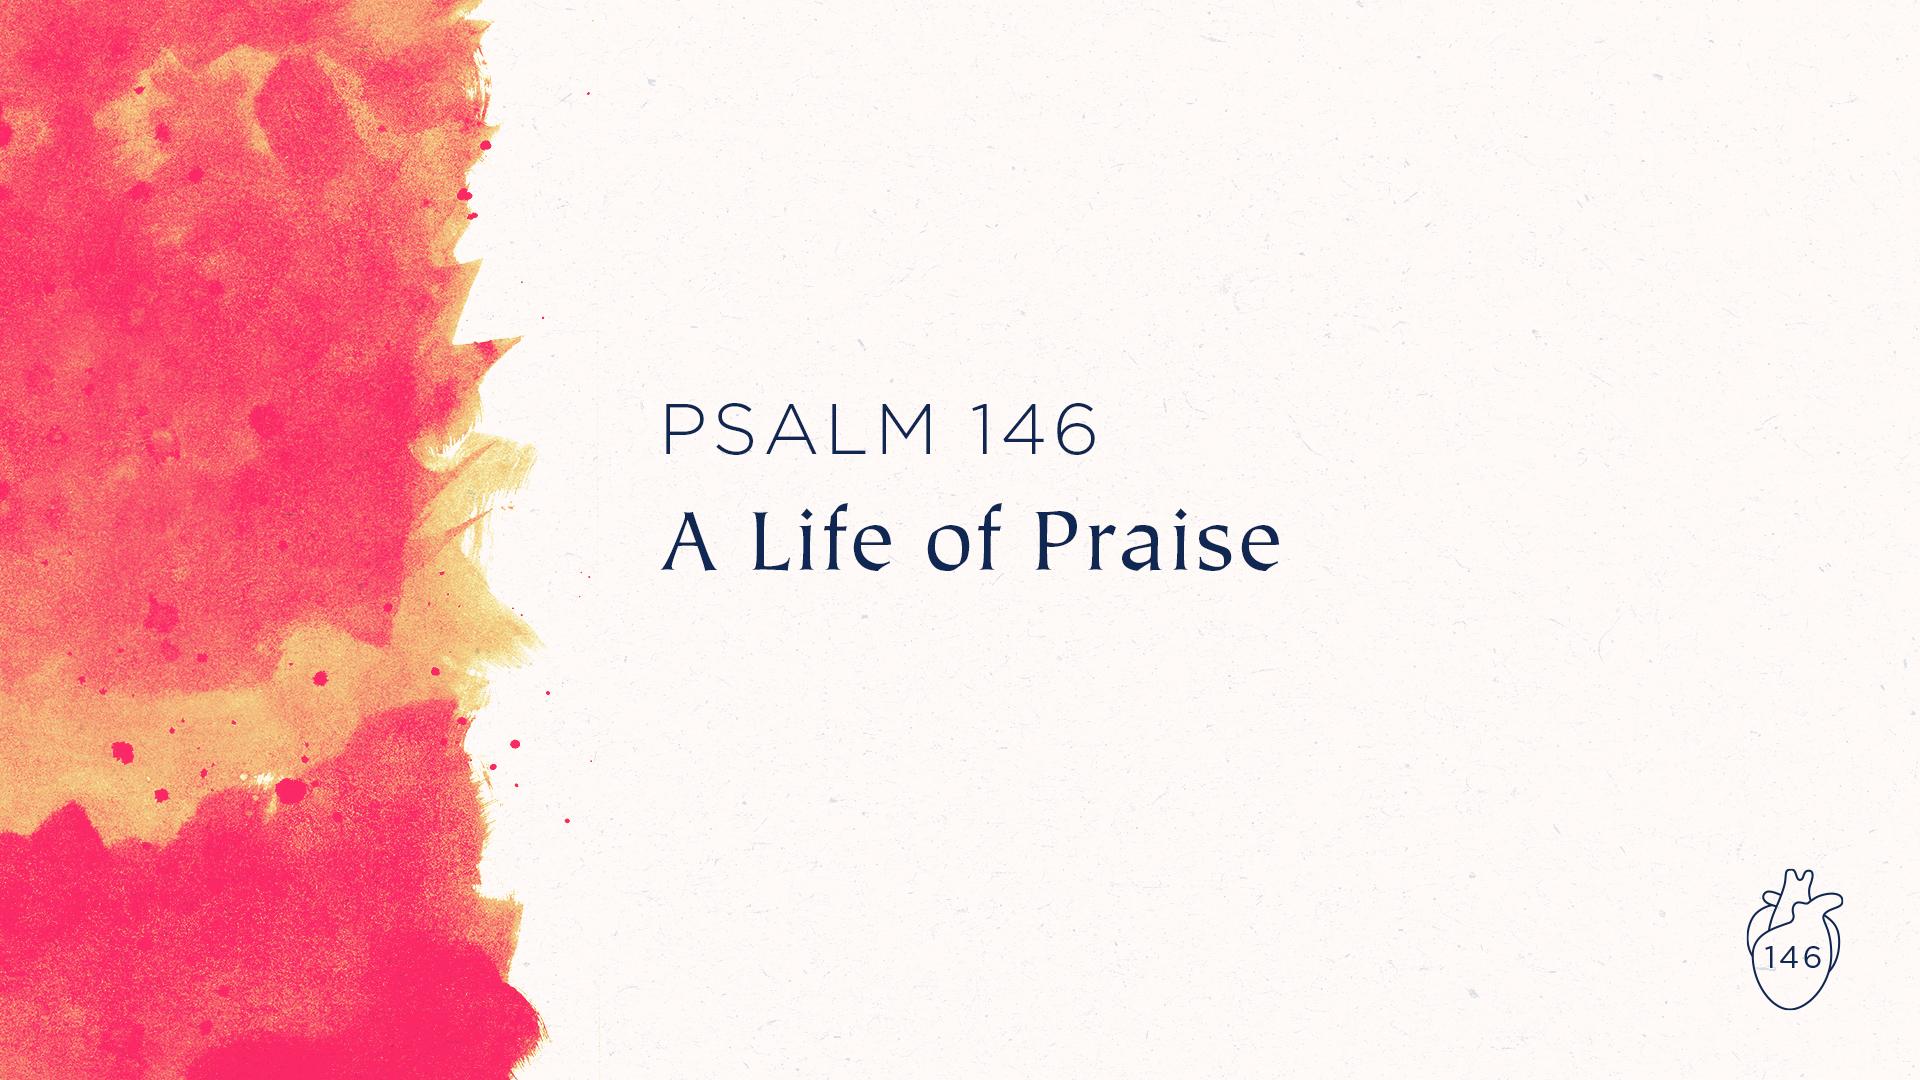 A Life of Praise